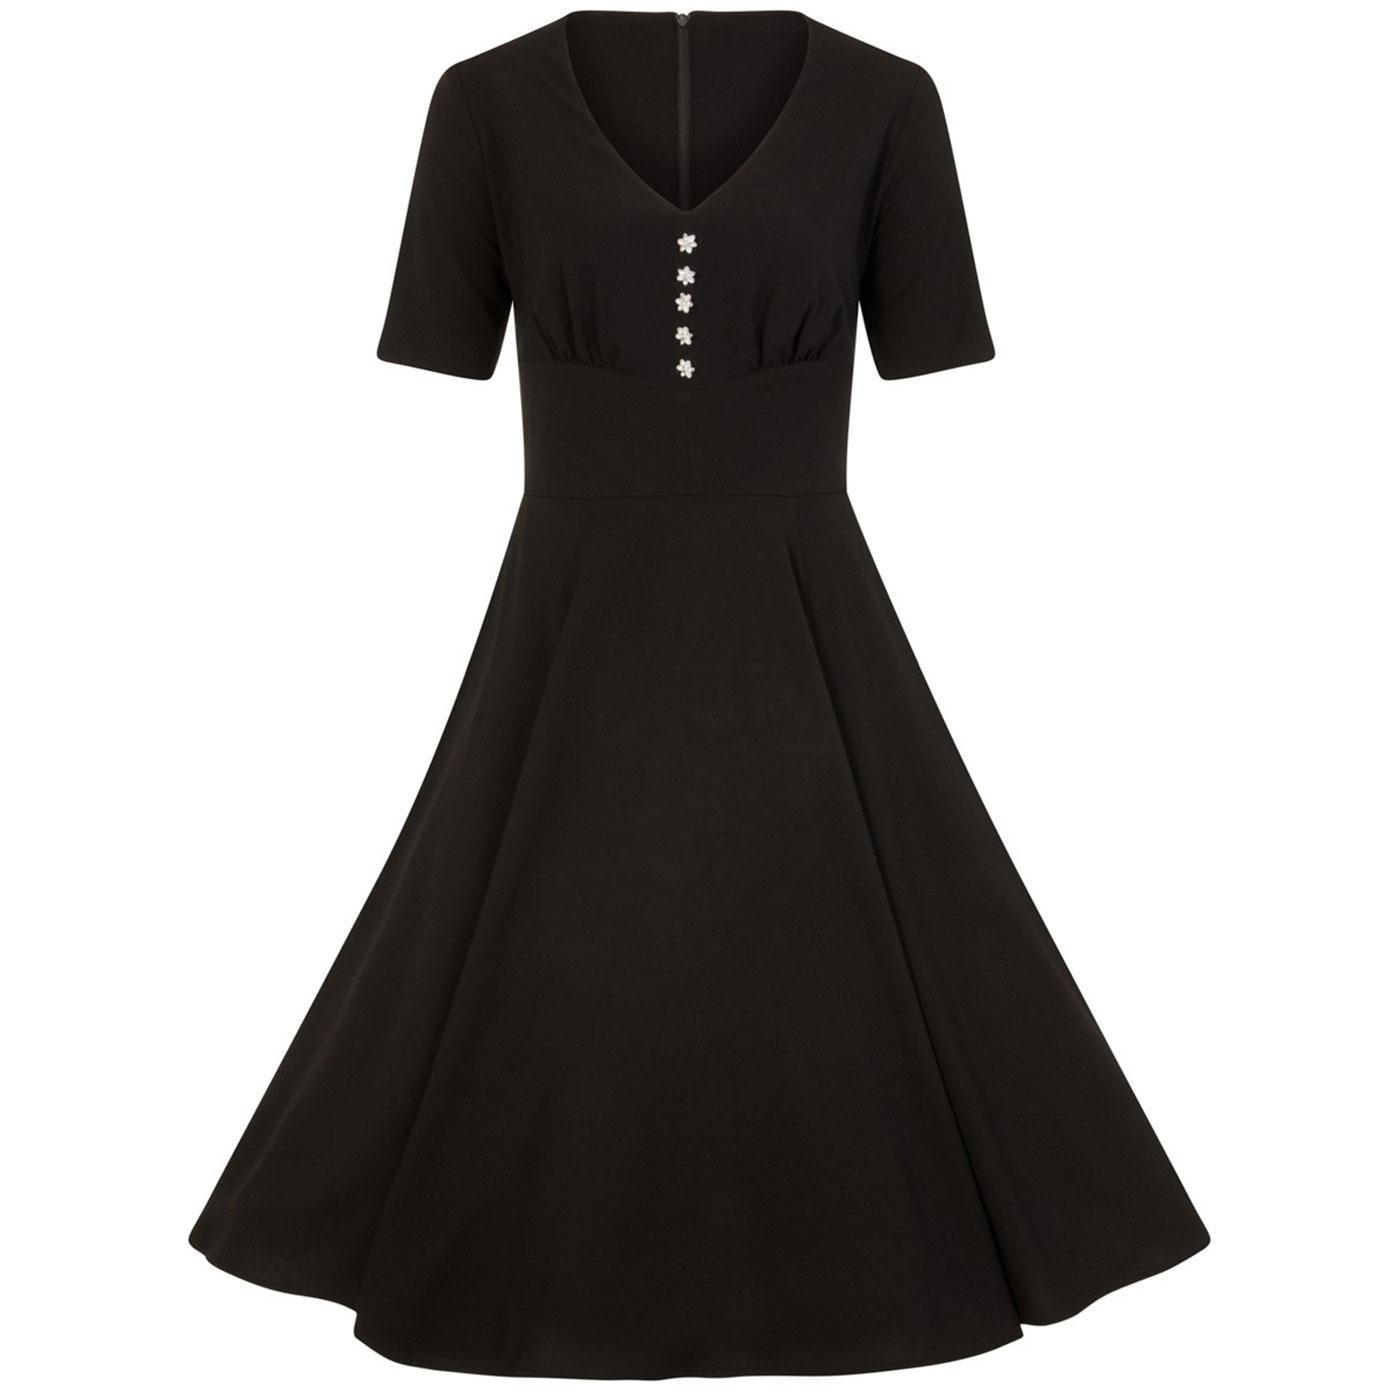 Mila HELL BUNNY 40s Vintage V-neck Dress in Black